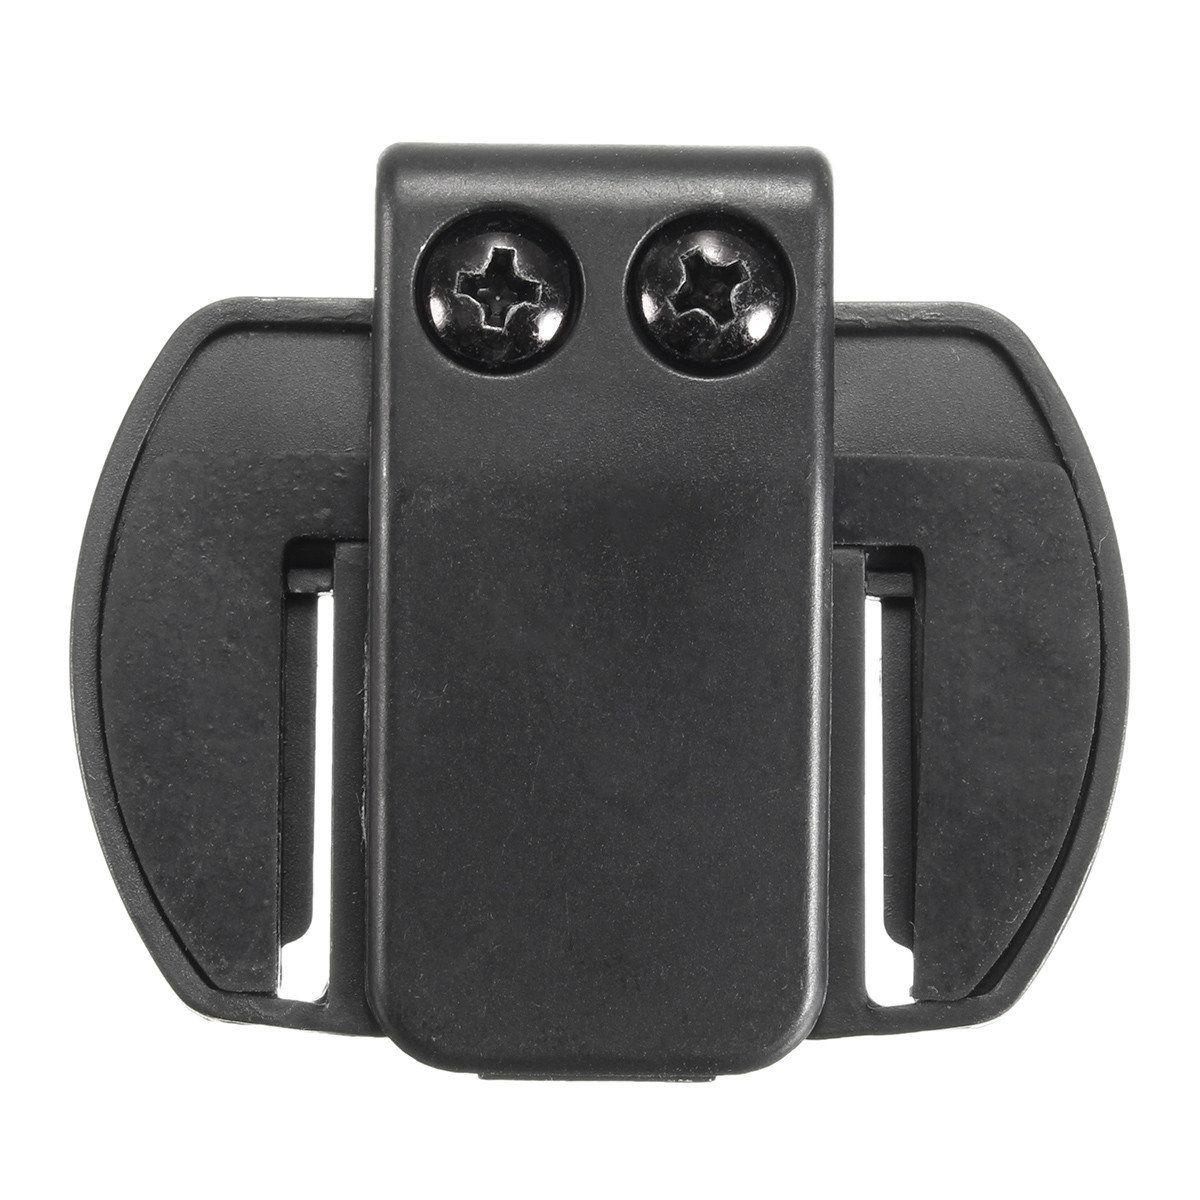 Intercom InterphonE-mount Clip for LX-R3 & R6 Motorcycle Intercom Headset